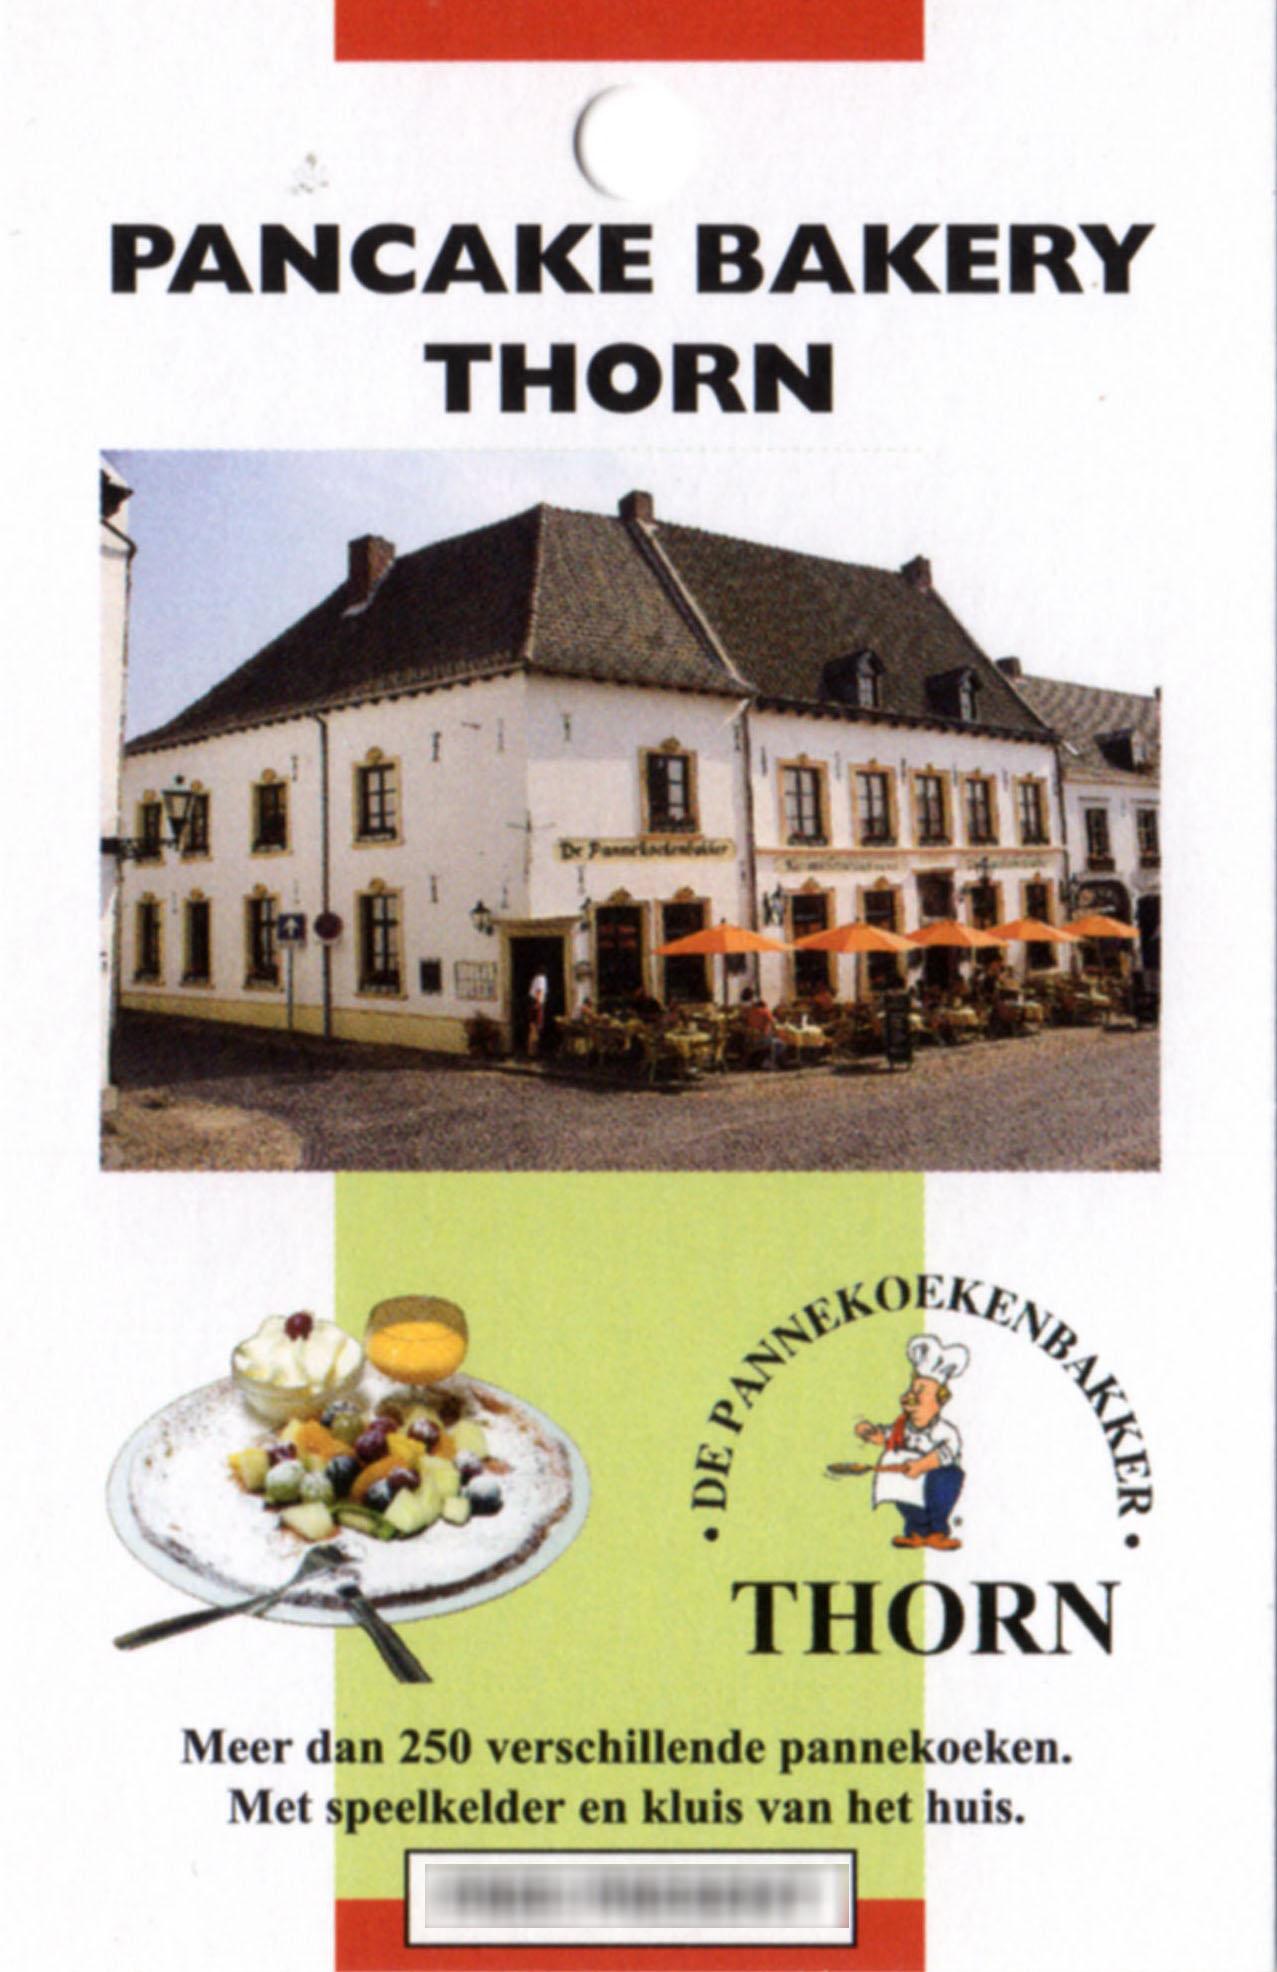 Pannenkoekenbakker Thorn